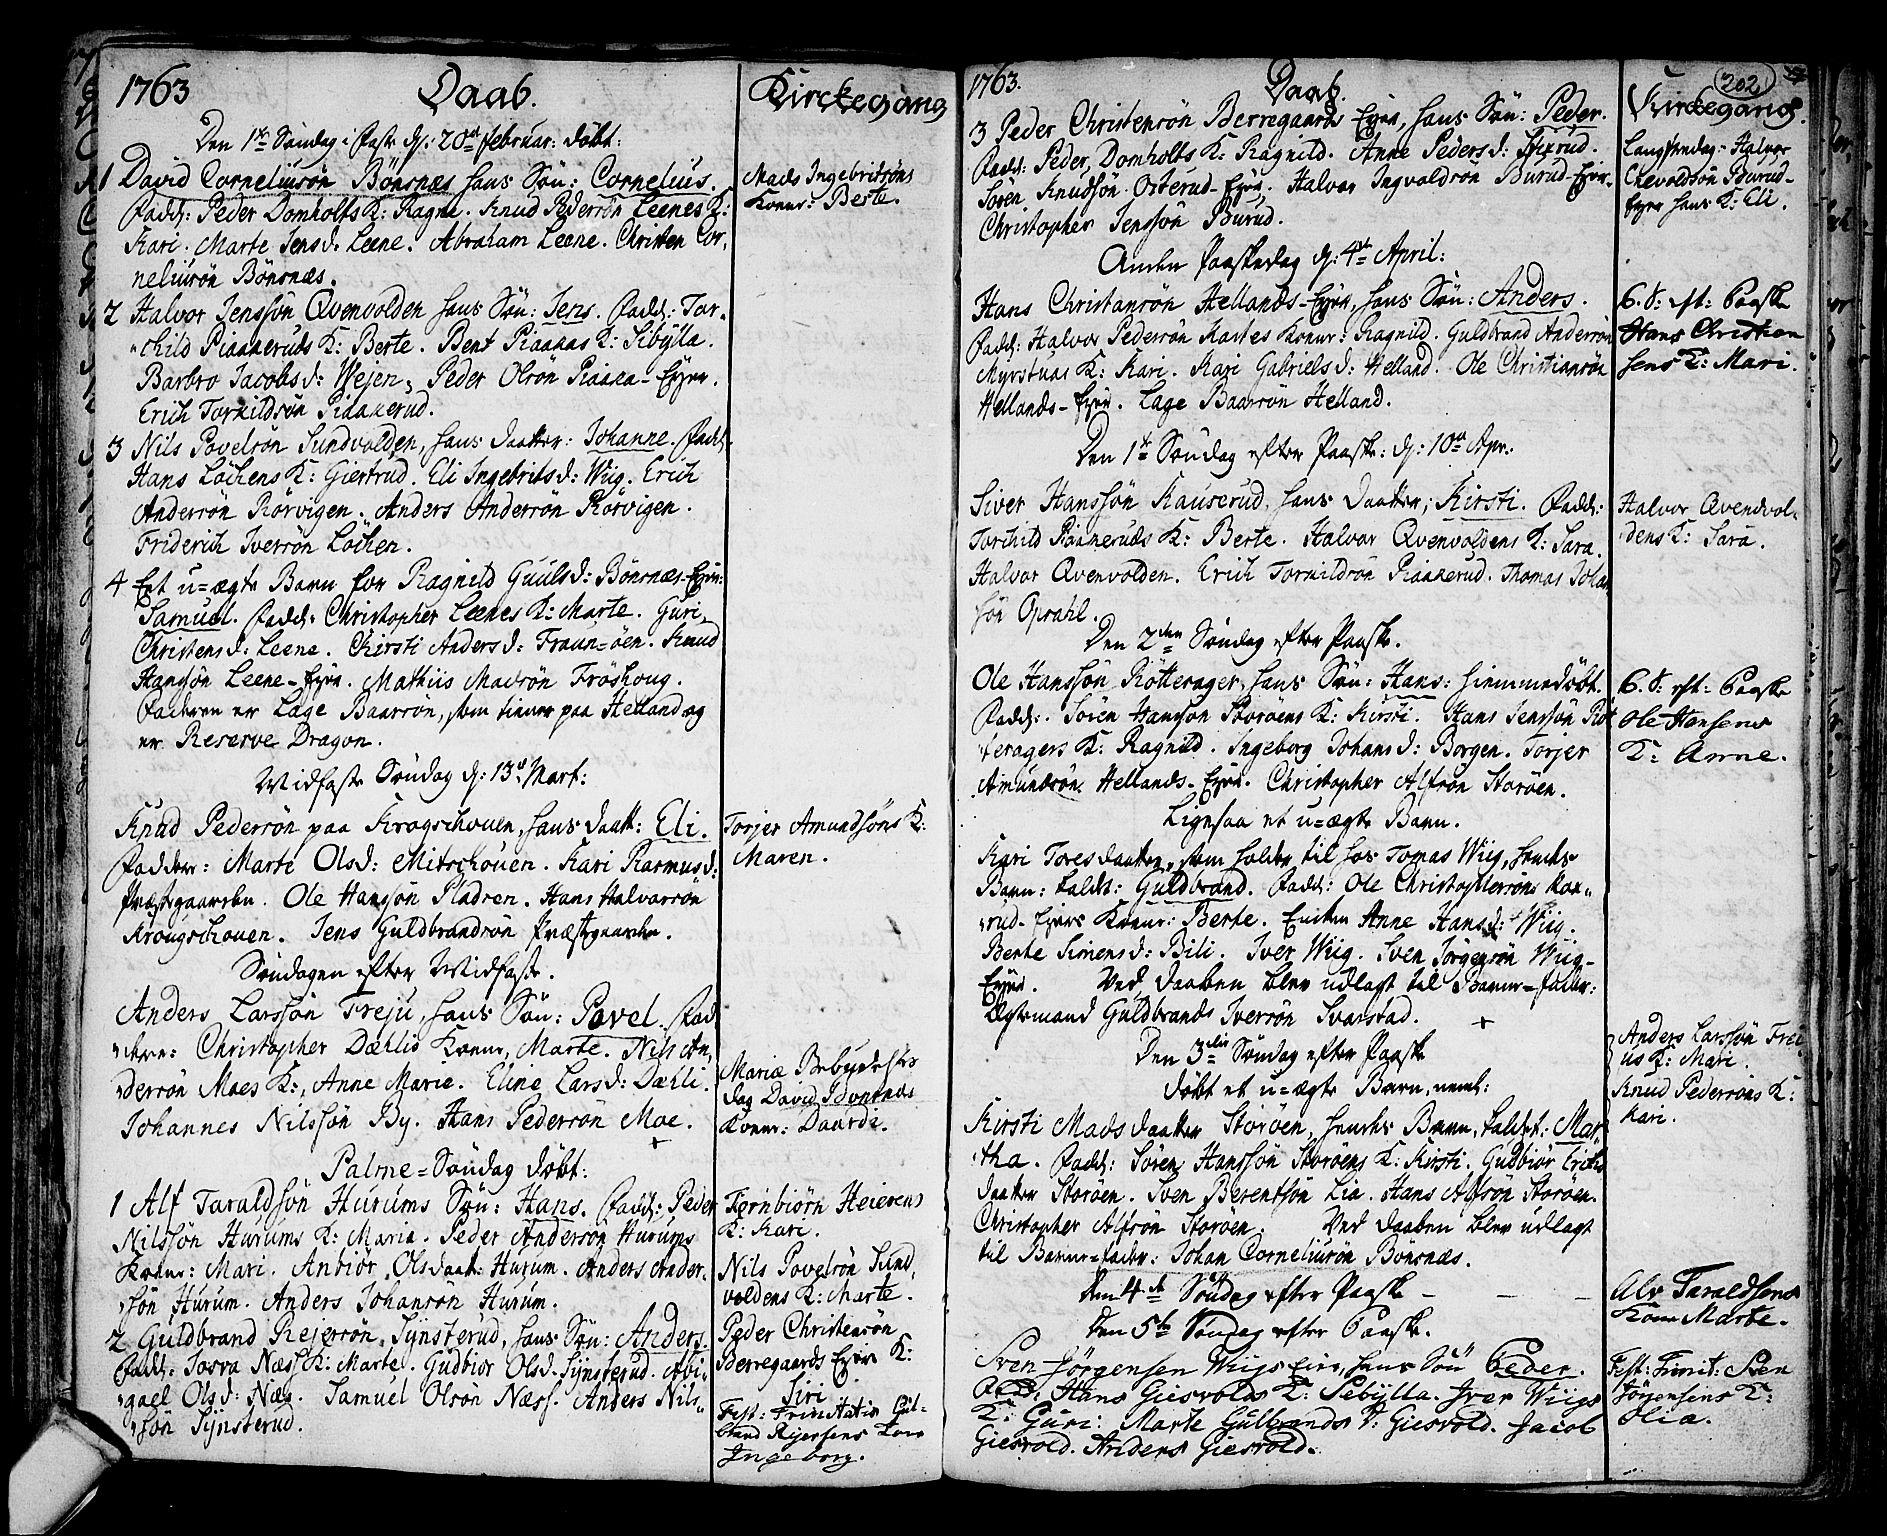 SAKO, Hole kirkebøker, F/Fa/L0001: Ministerialbok nr. I 1, 1716-1765, s. 202